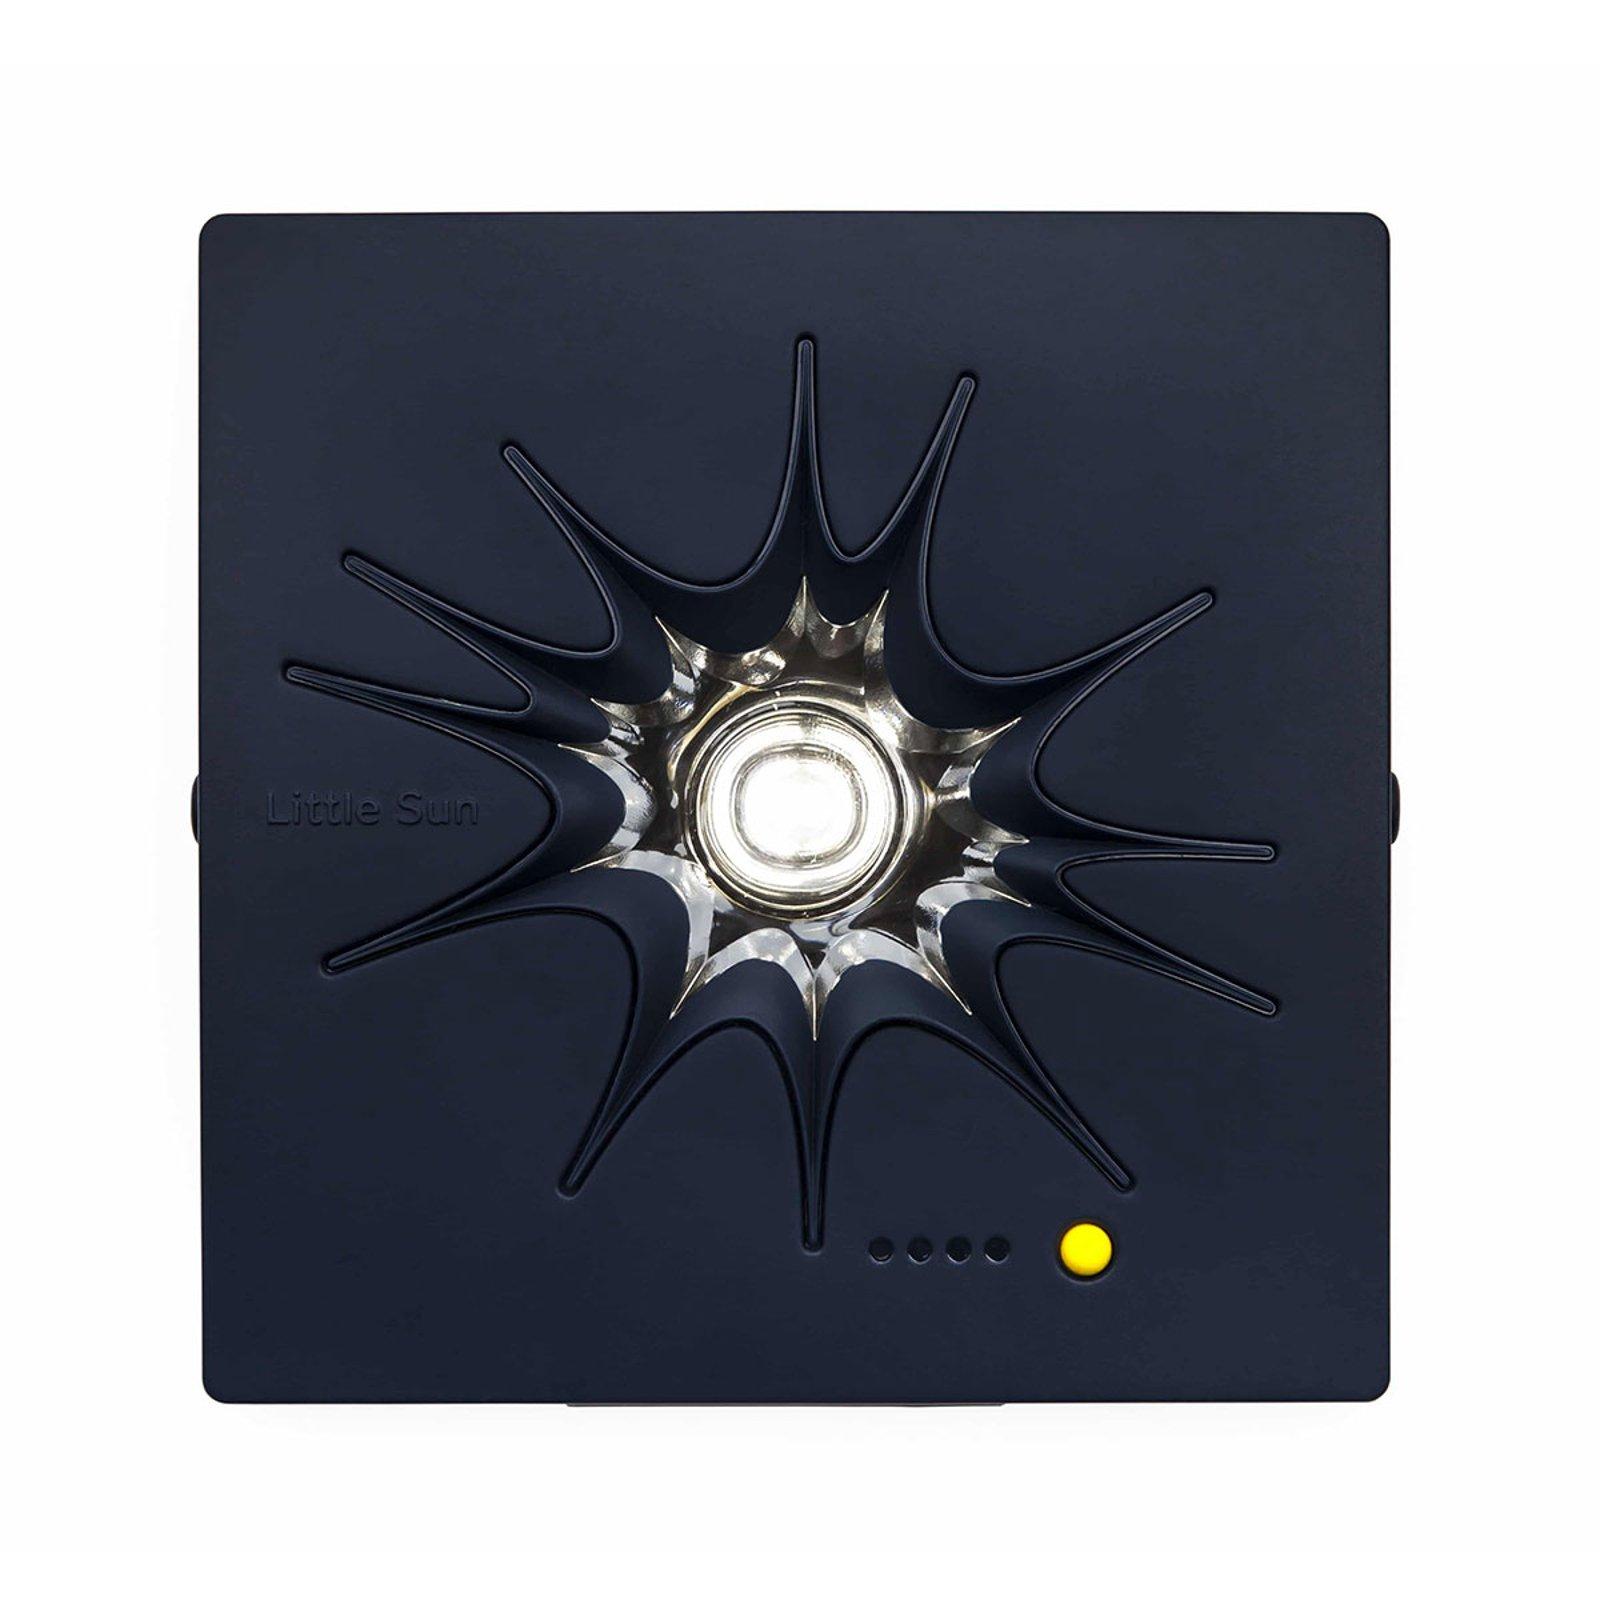 Little Sun Charge LED-solcellelampe med USB-port